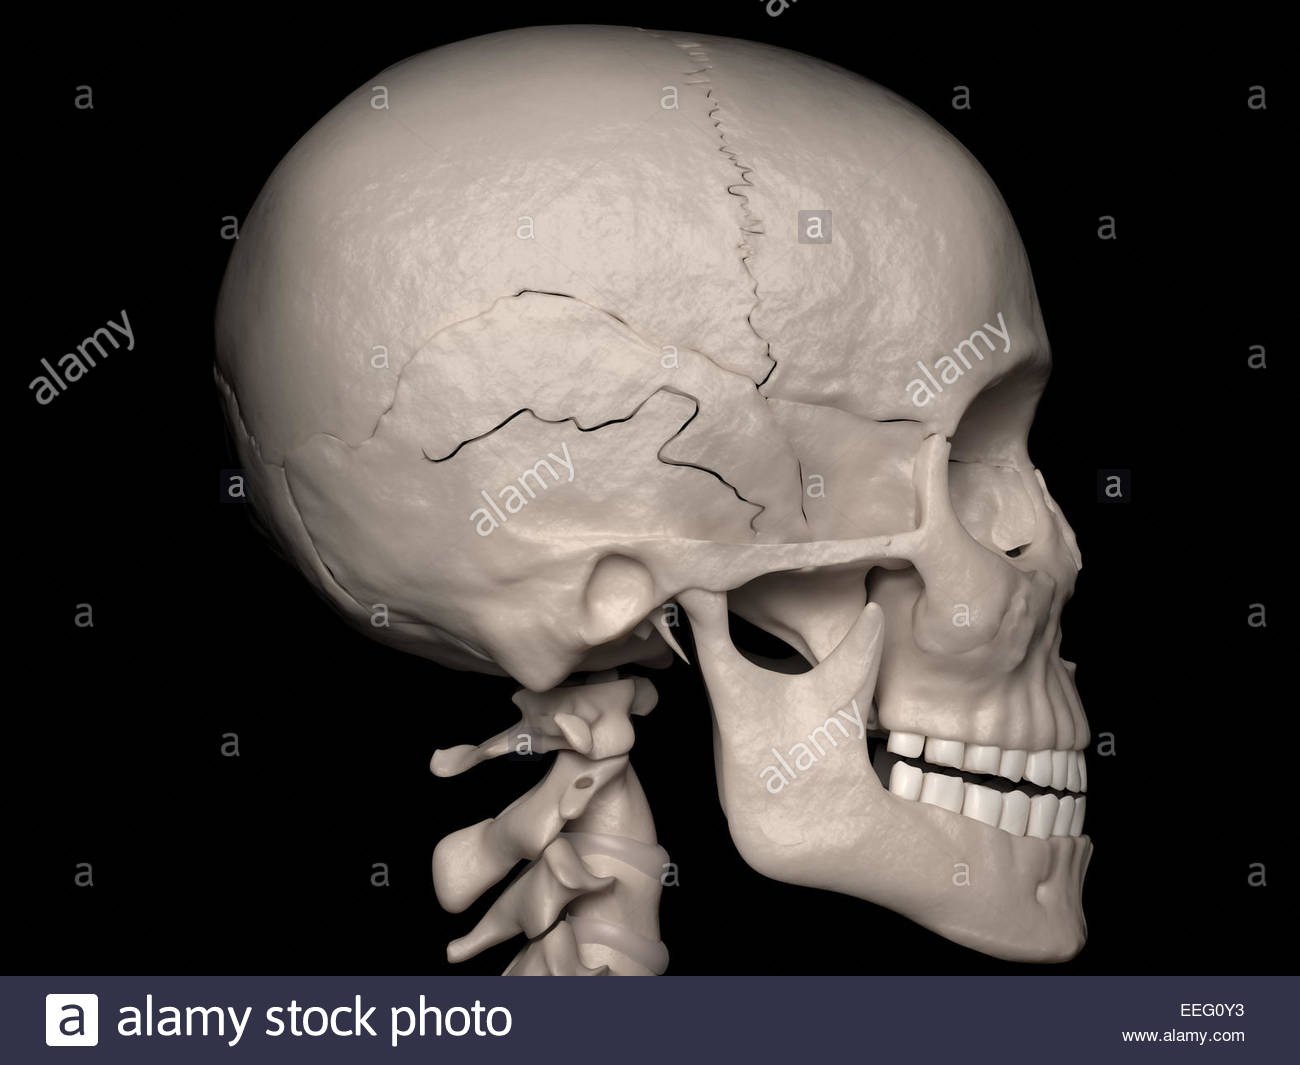 Temporal Bone Stockfotos & Temporal Bone Bilder - Alamy